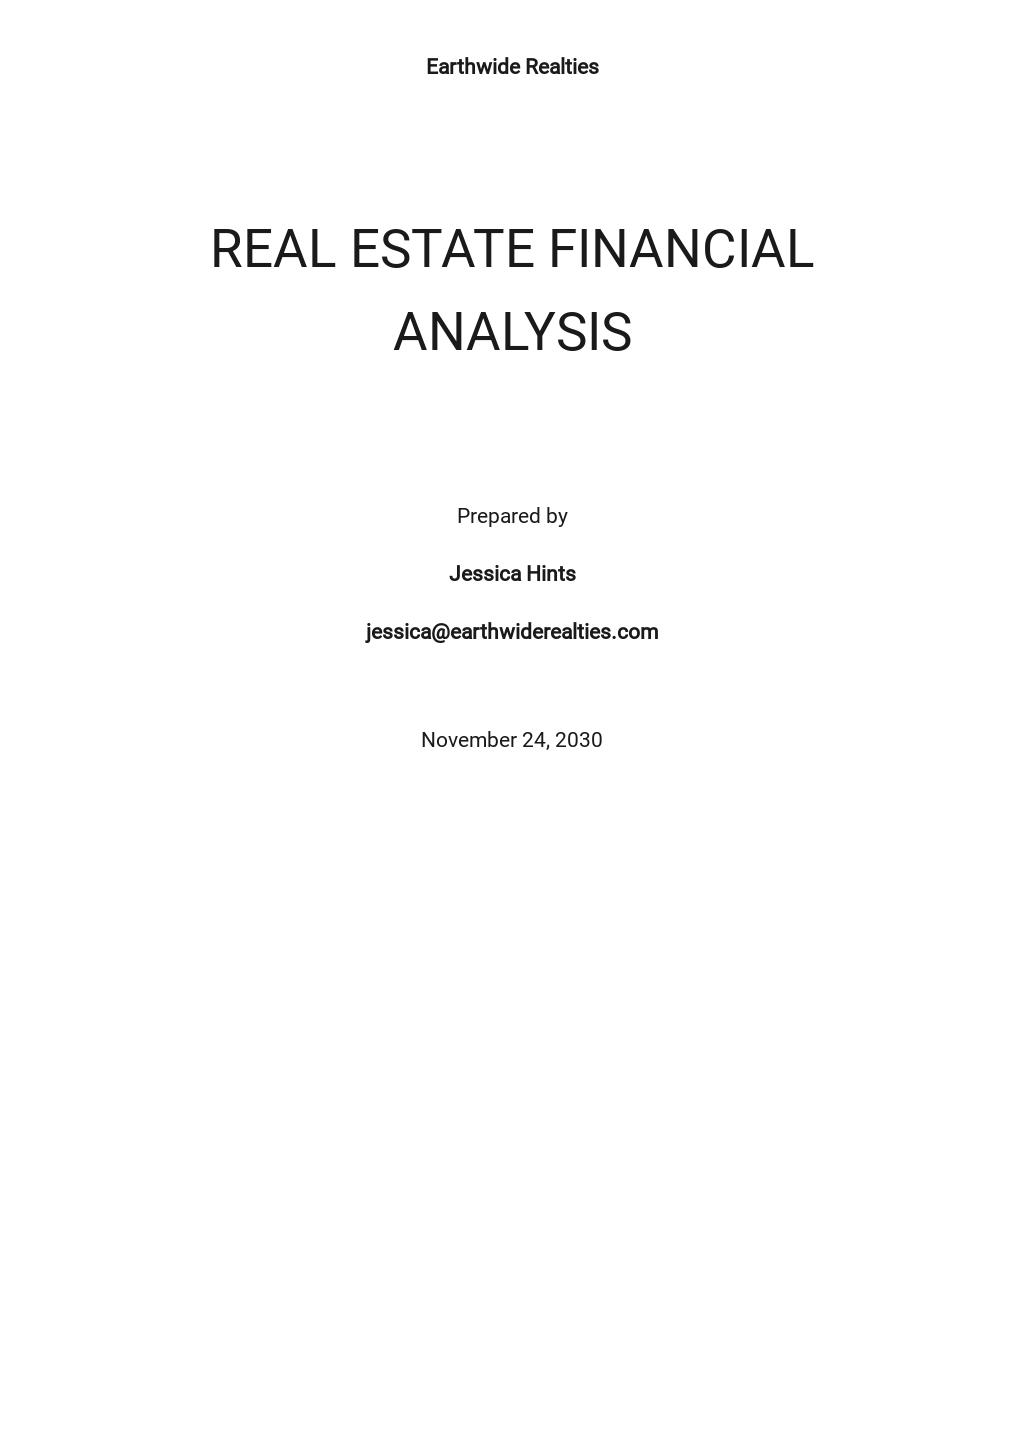 Real Estate Financial Analysis Template.jpe